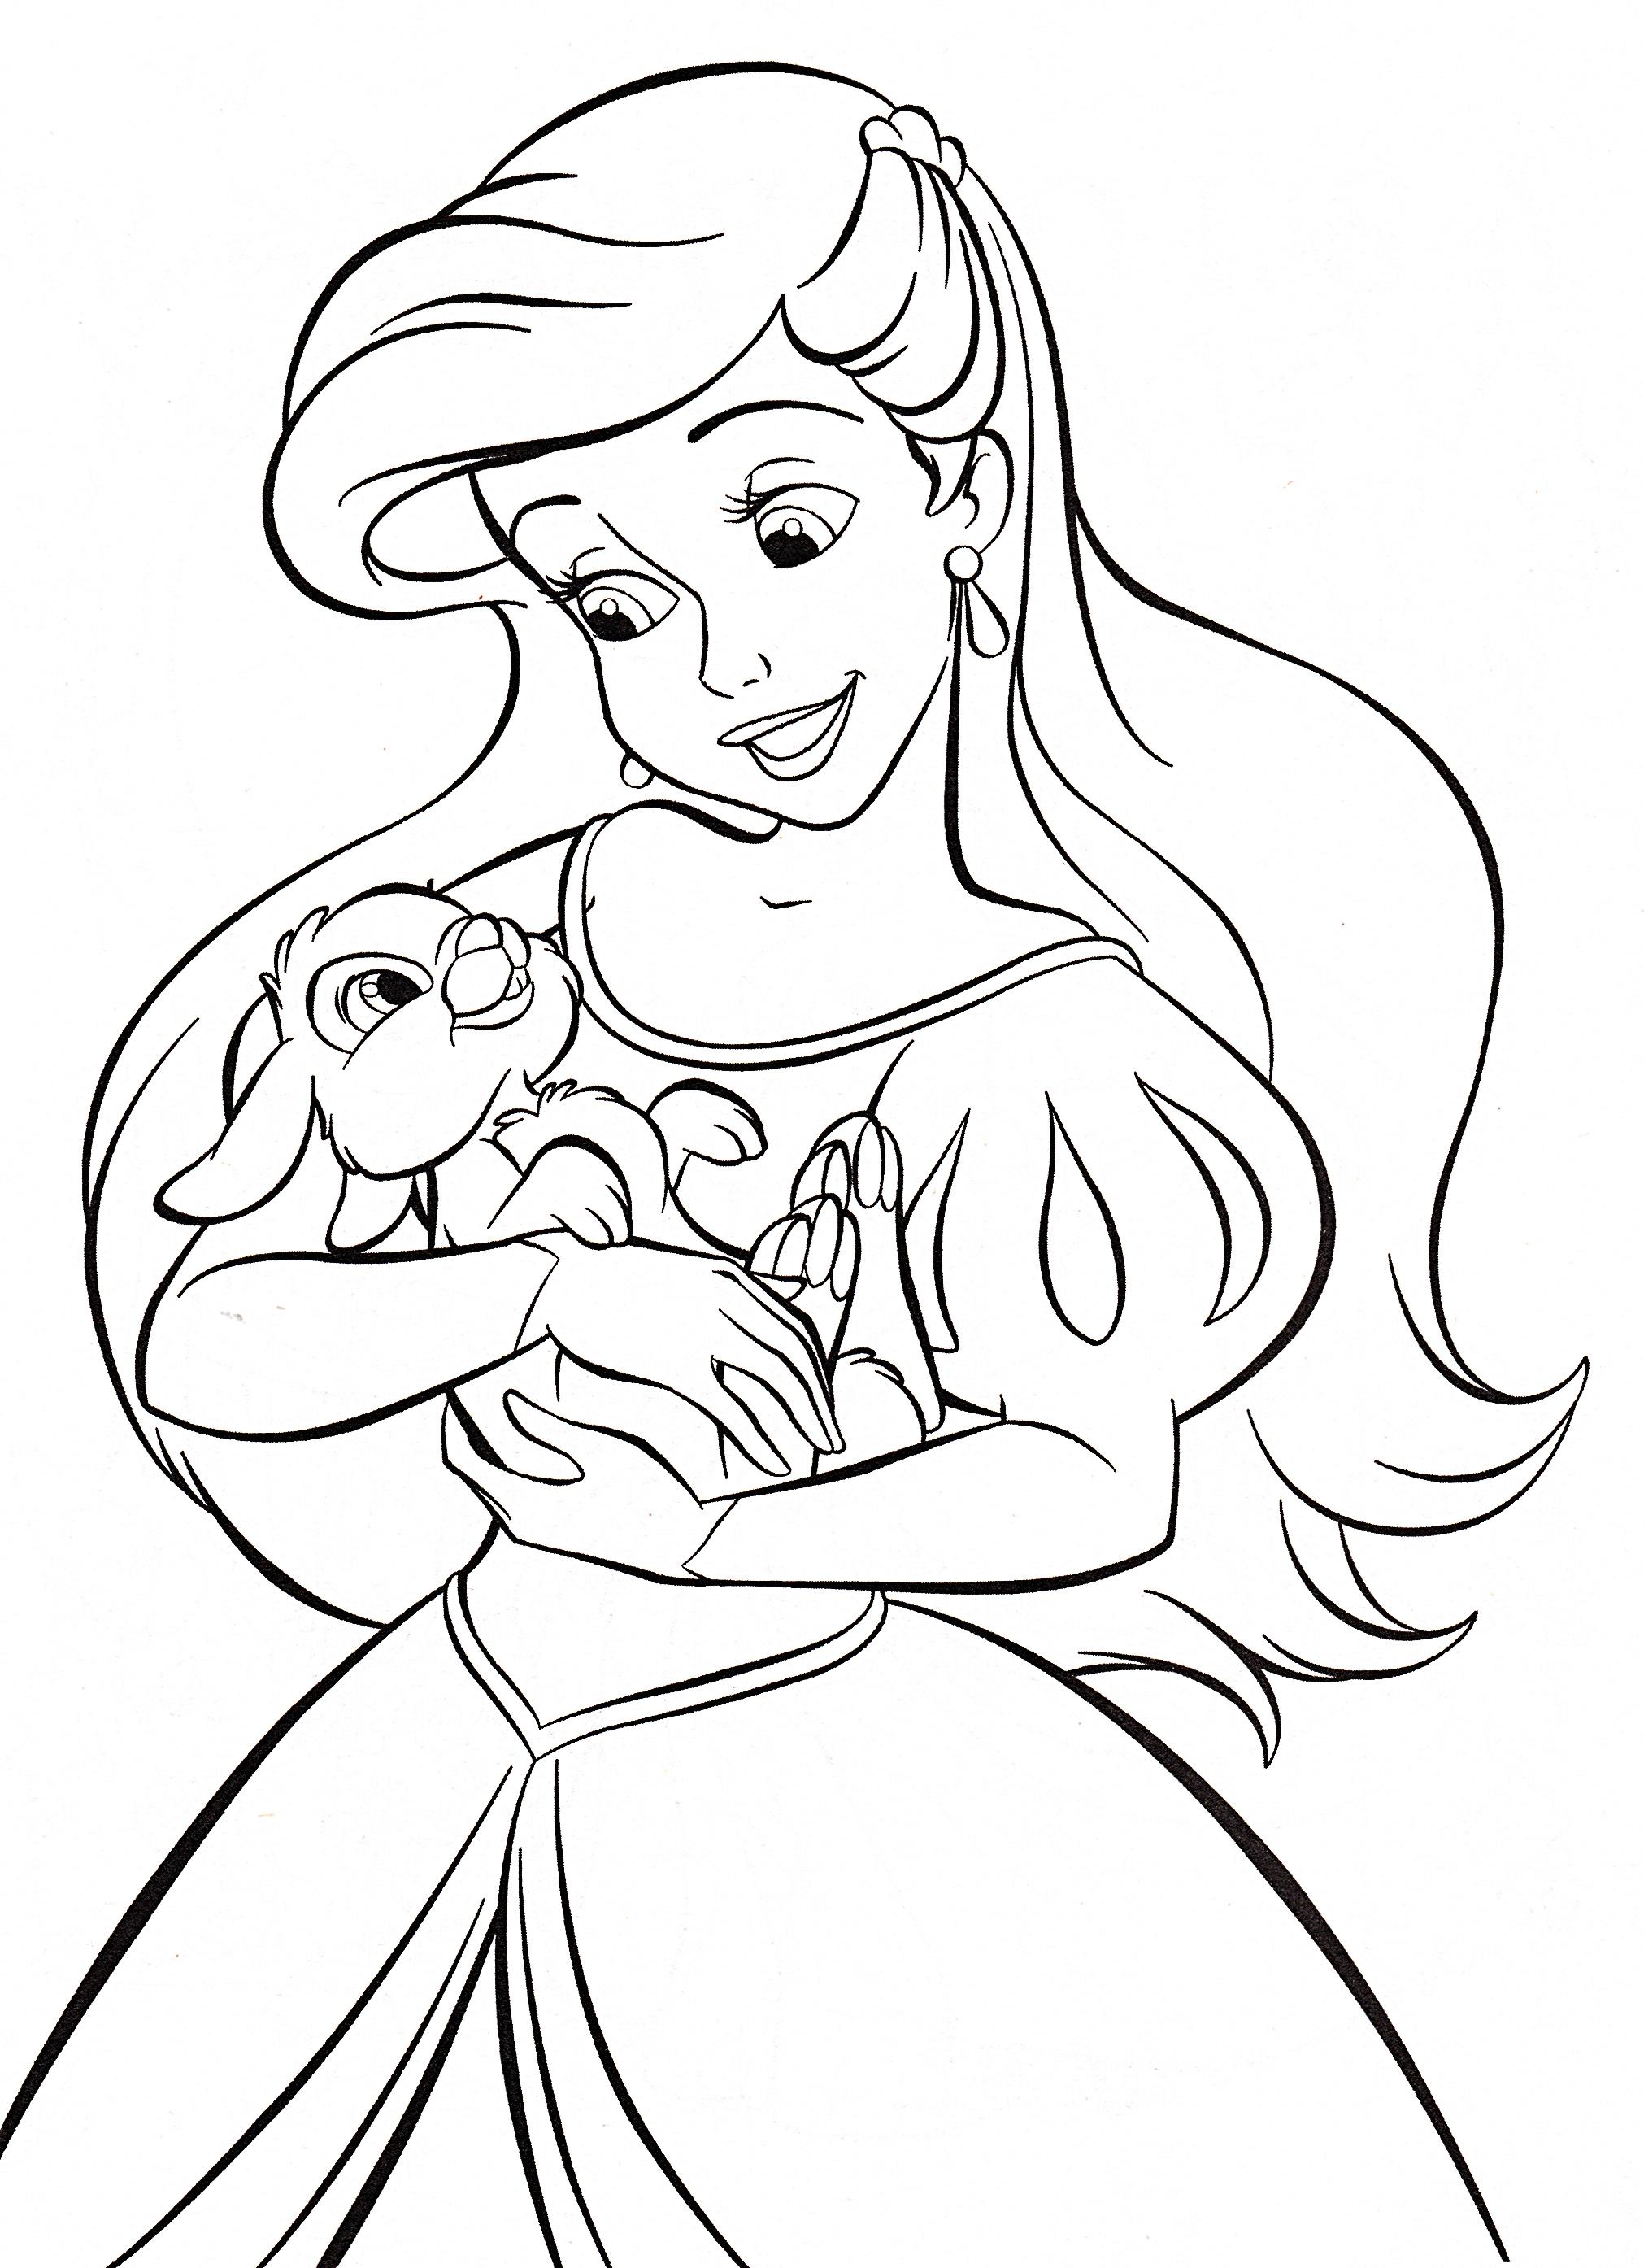 Princess ariel coloring pages games - Disney Princess Baby Ariel Coloring Pages Princess Coloring Pages Ariel Baby Disney Princess Coloring Pages